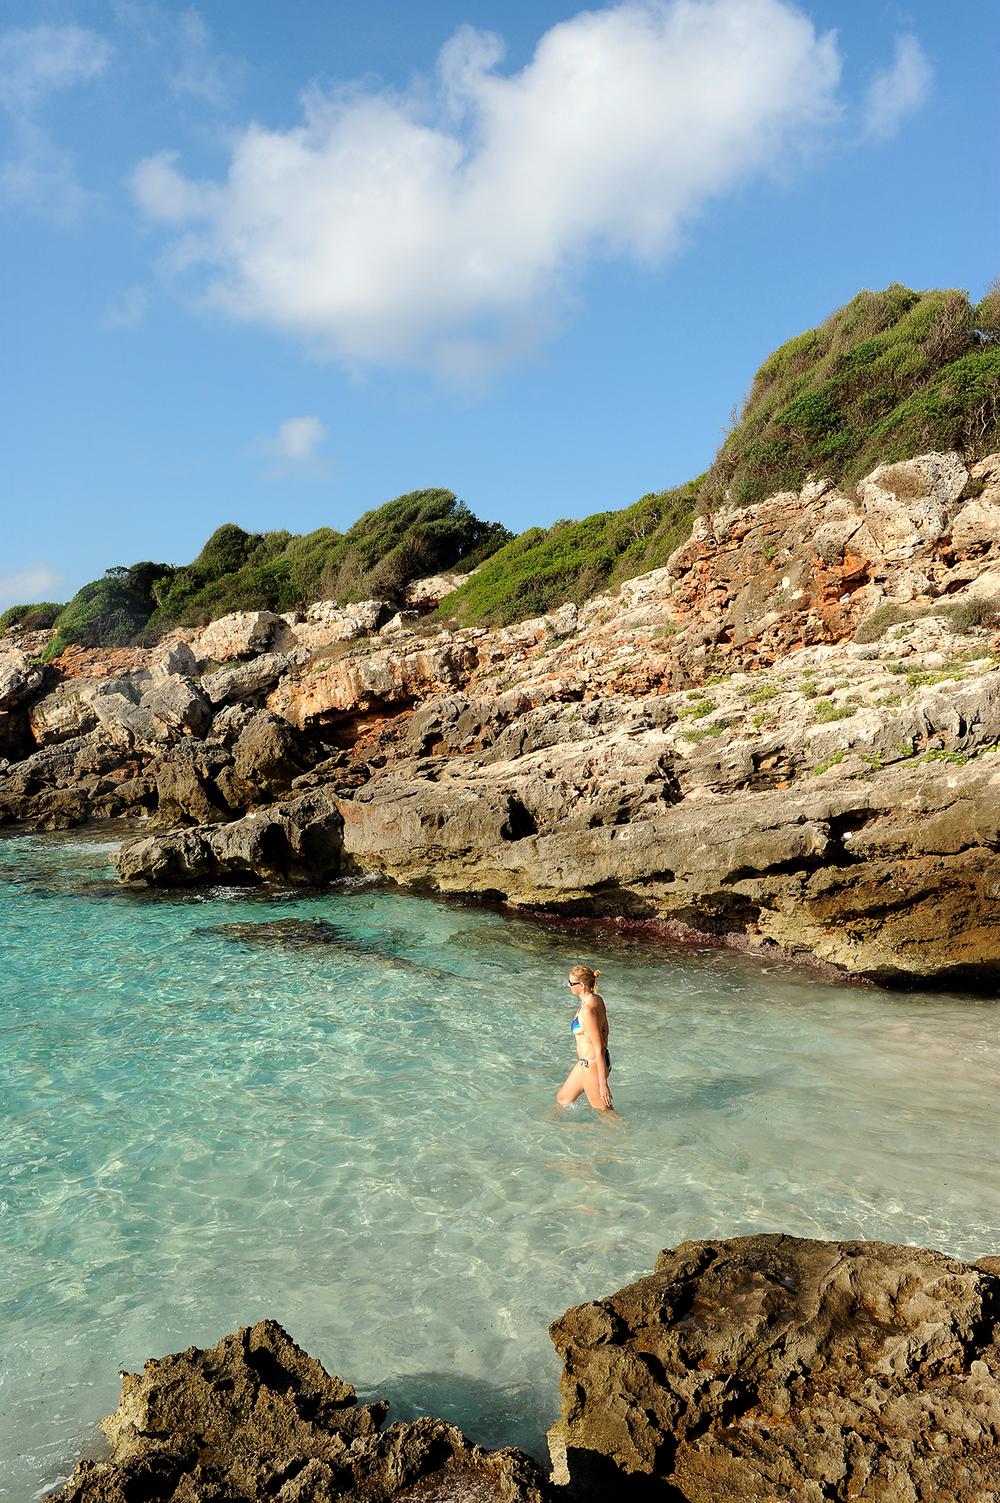 Menorca, Välimeri, matkablogi, meri, matka, Espanja